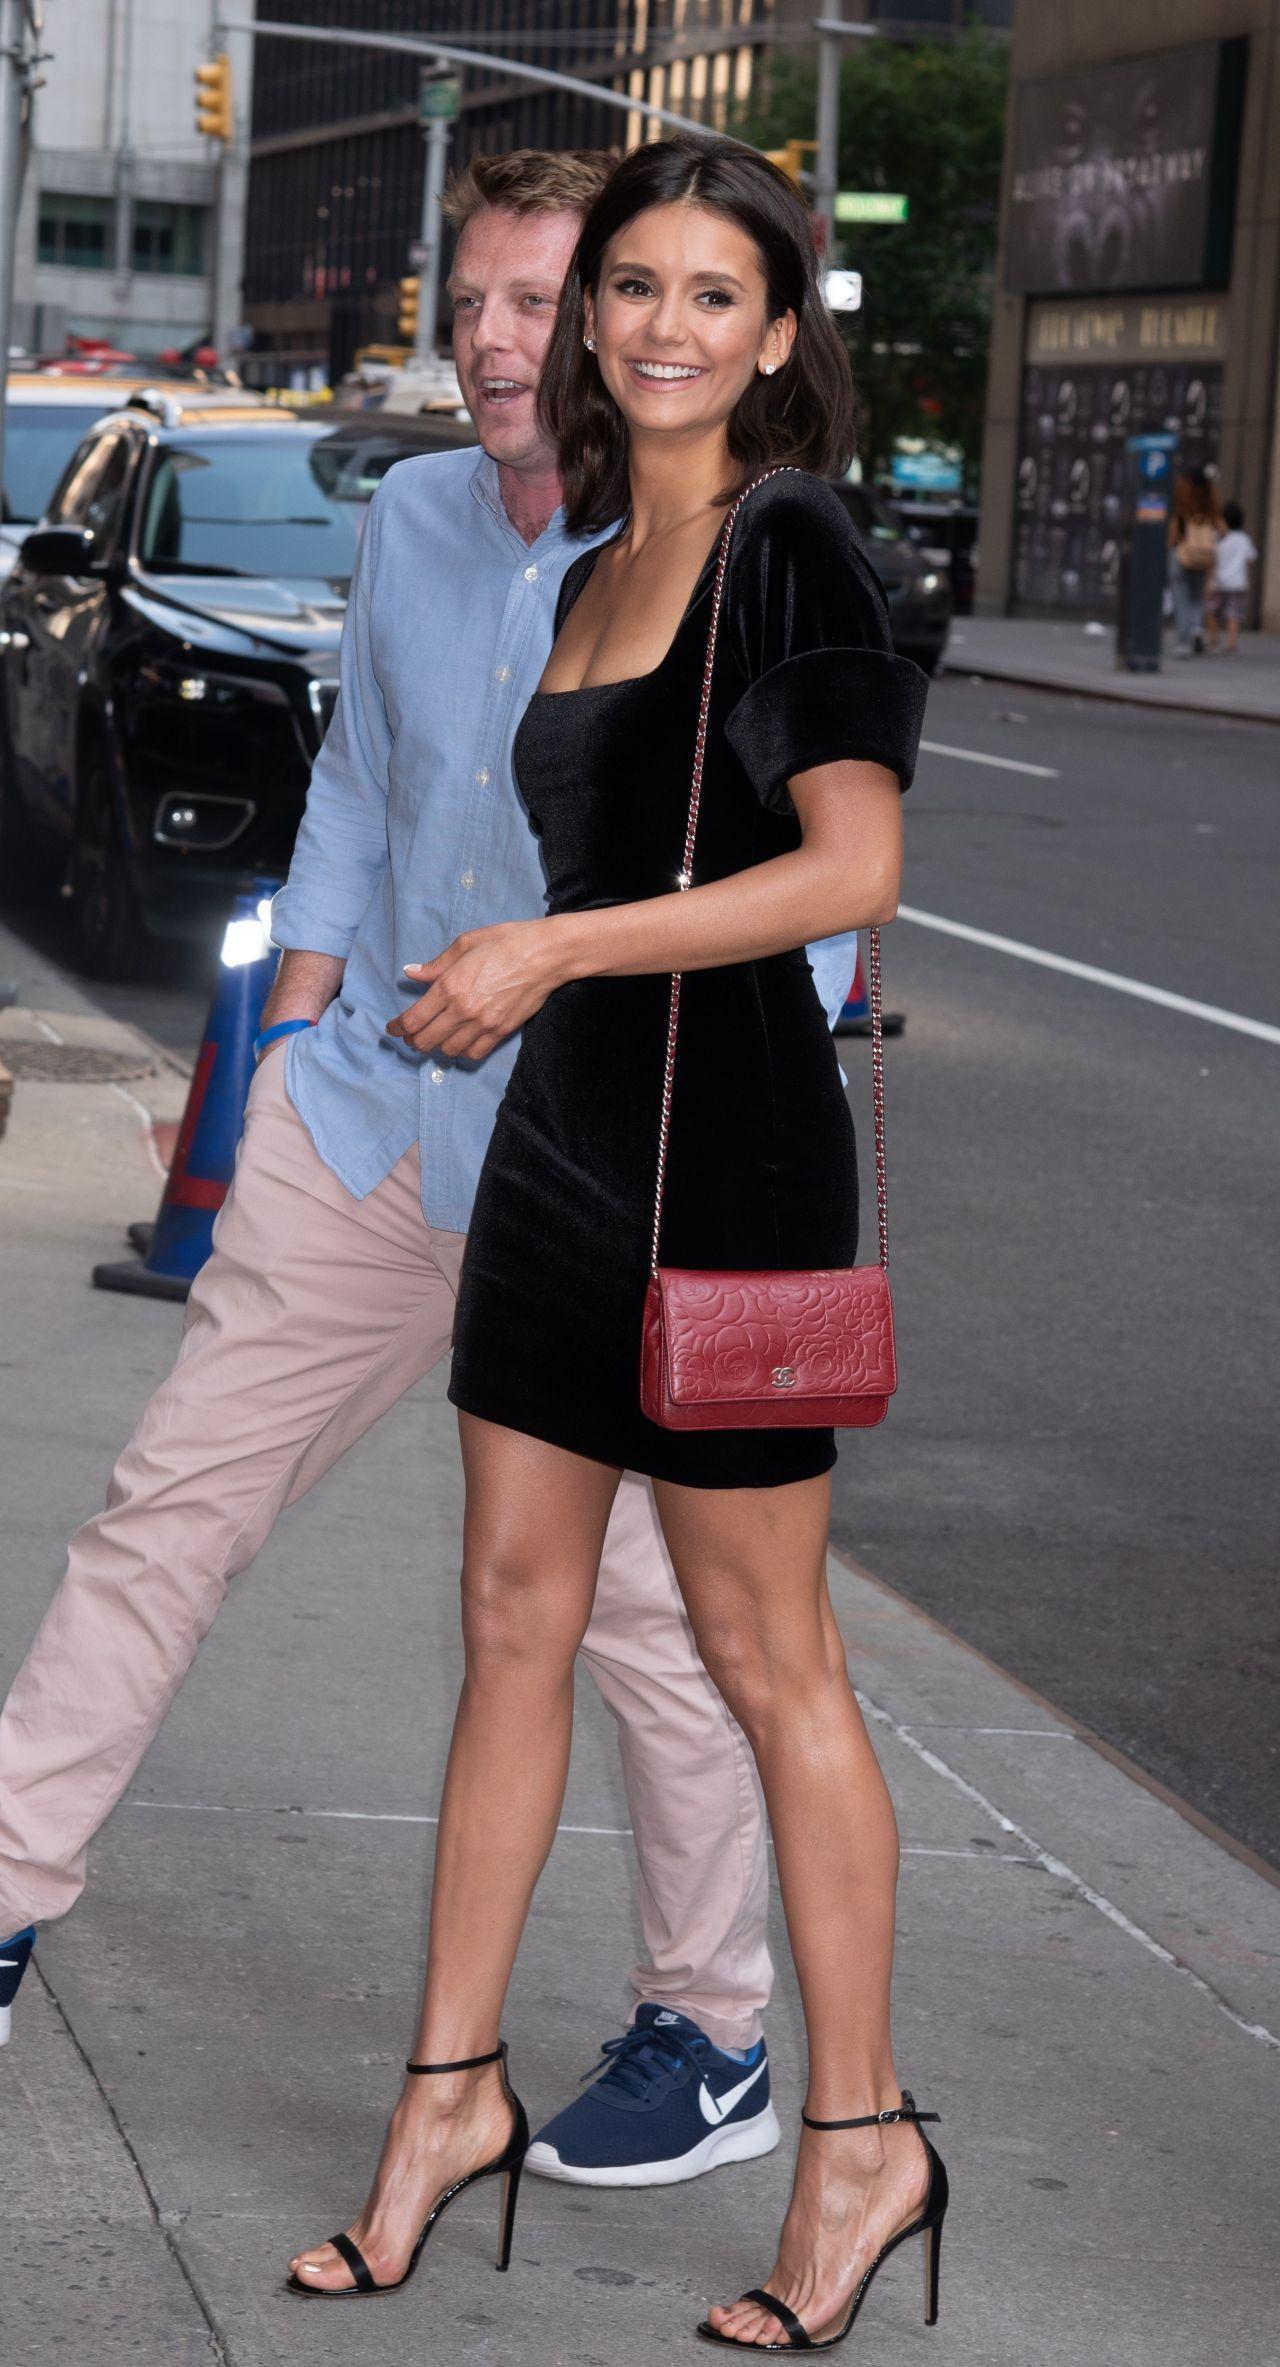 Nina brune sucerminot escorts@todorazor.com